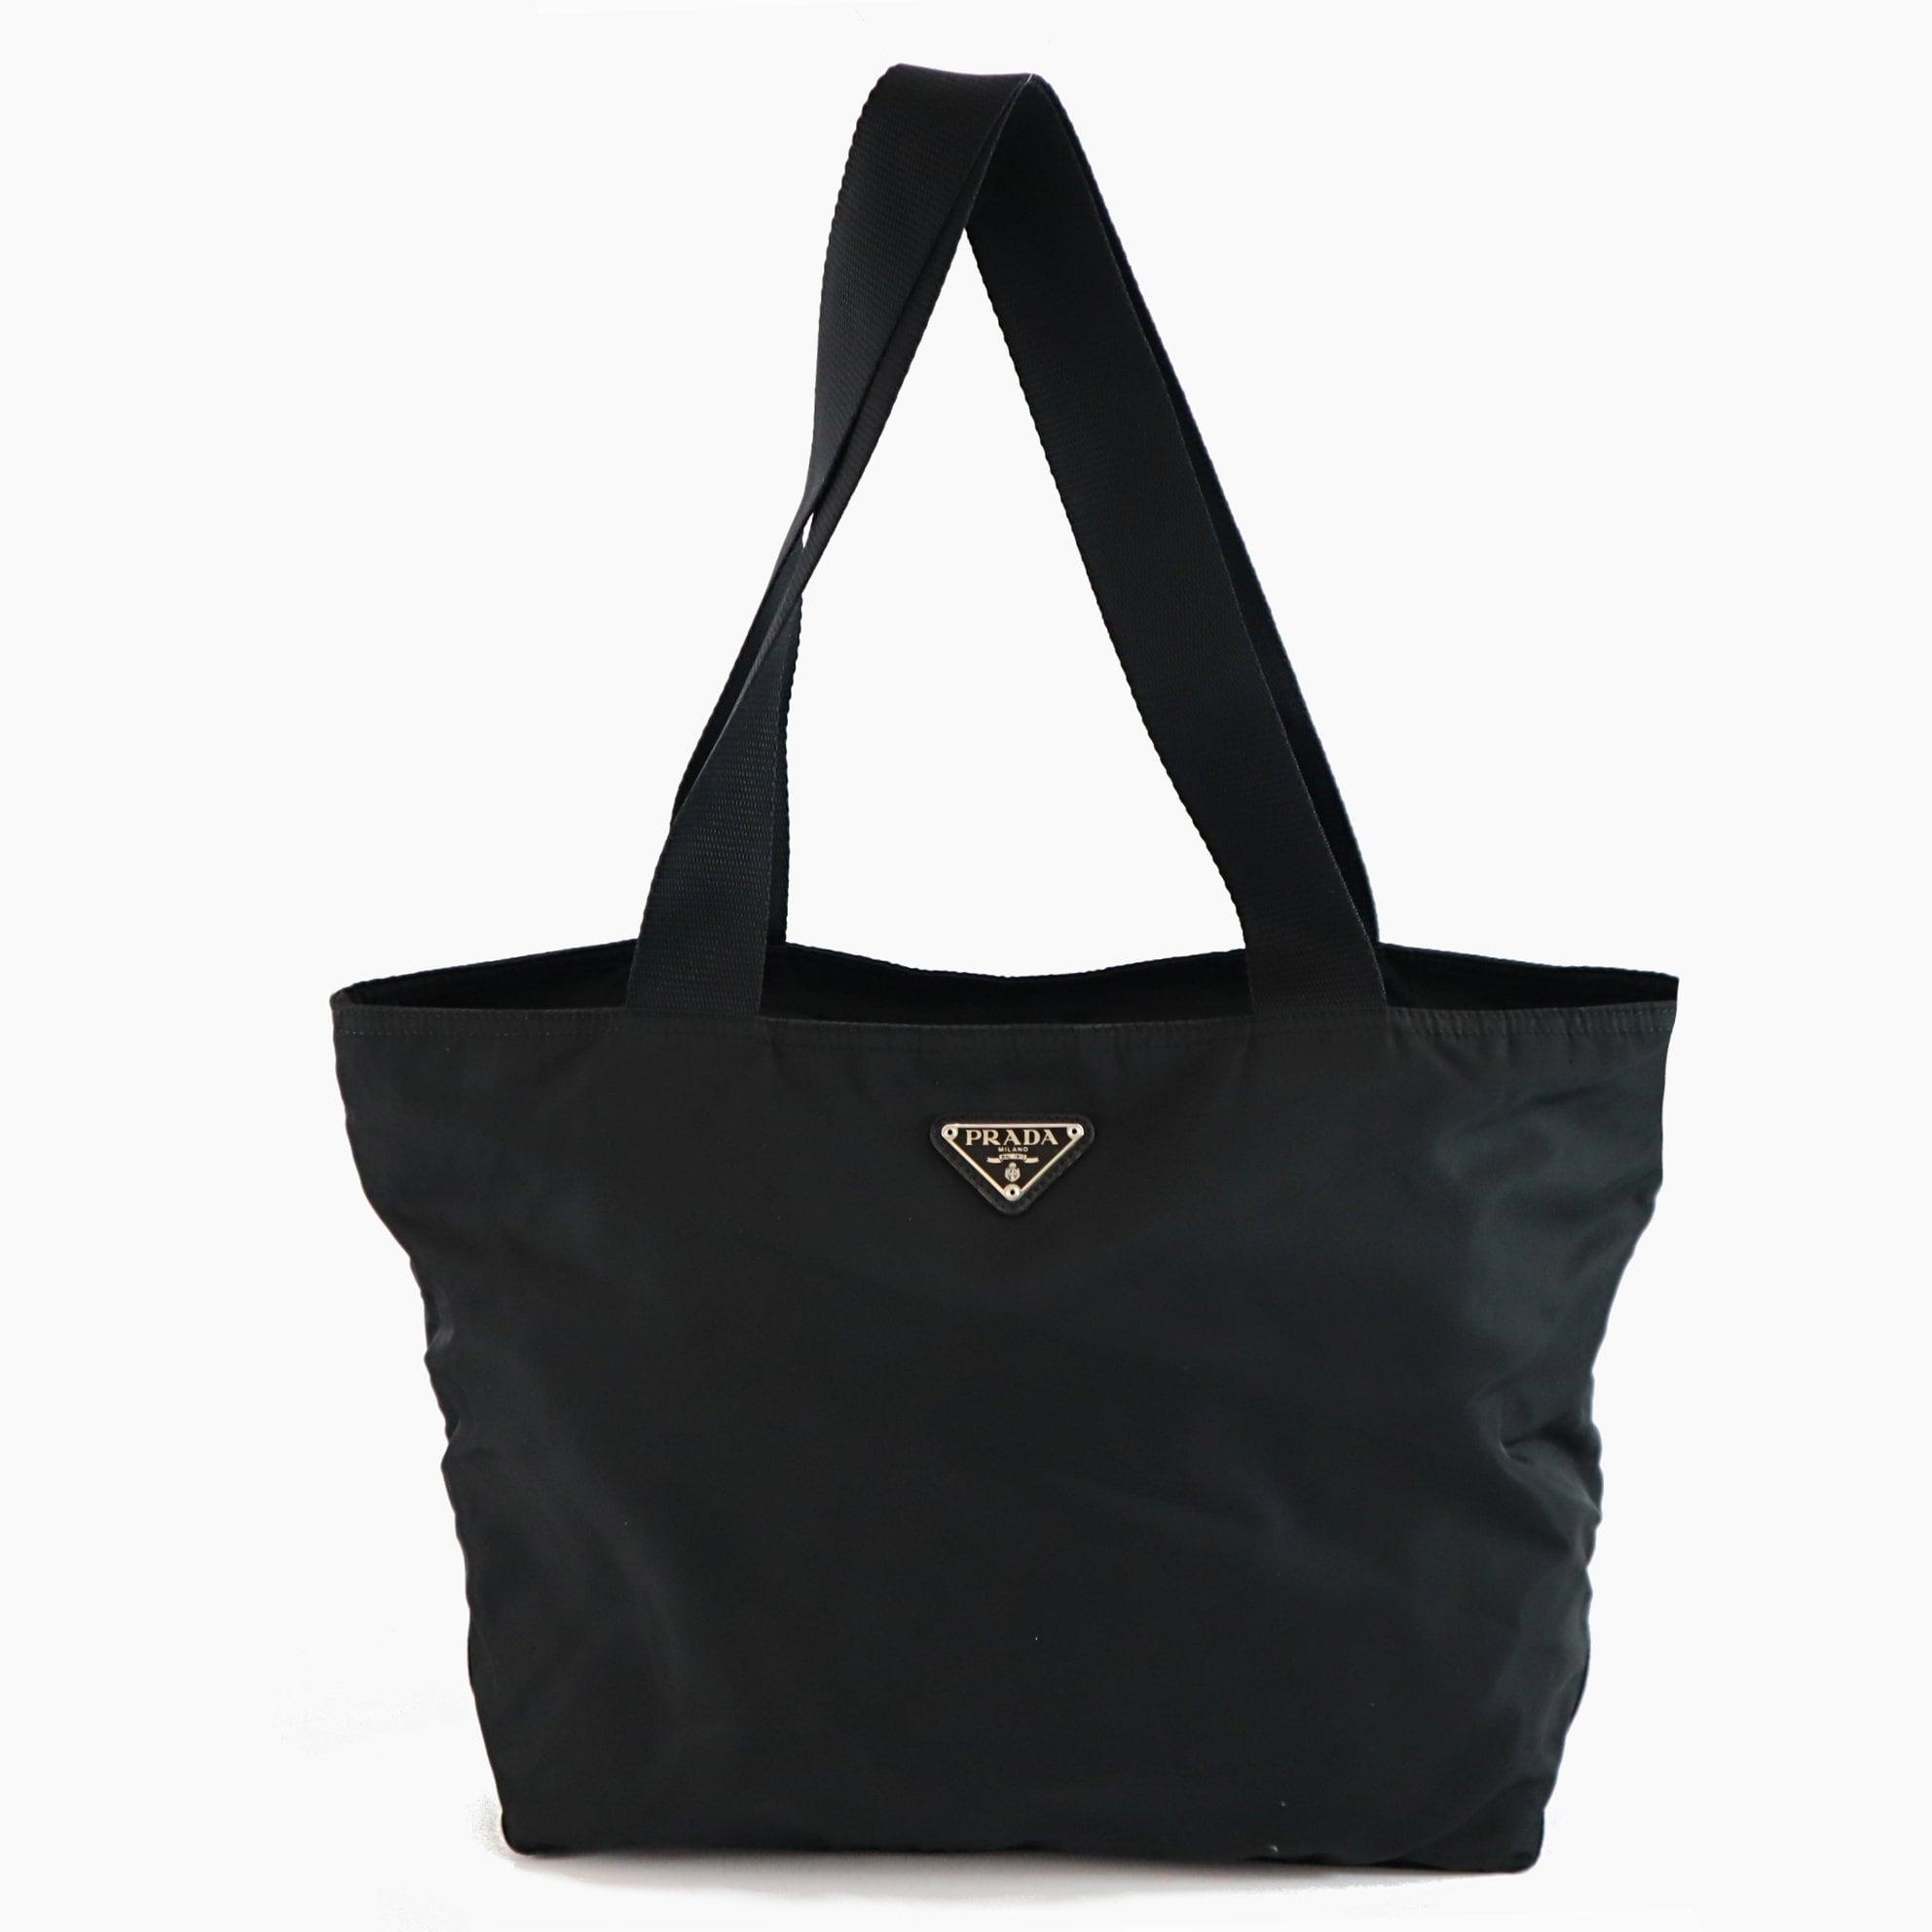 b9c7b423370e0 Prada Nylon Vintage Black Handbag Shoulder Tote bag